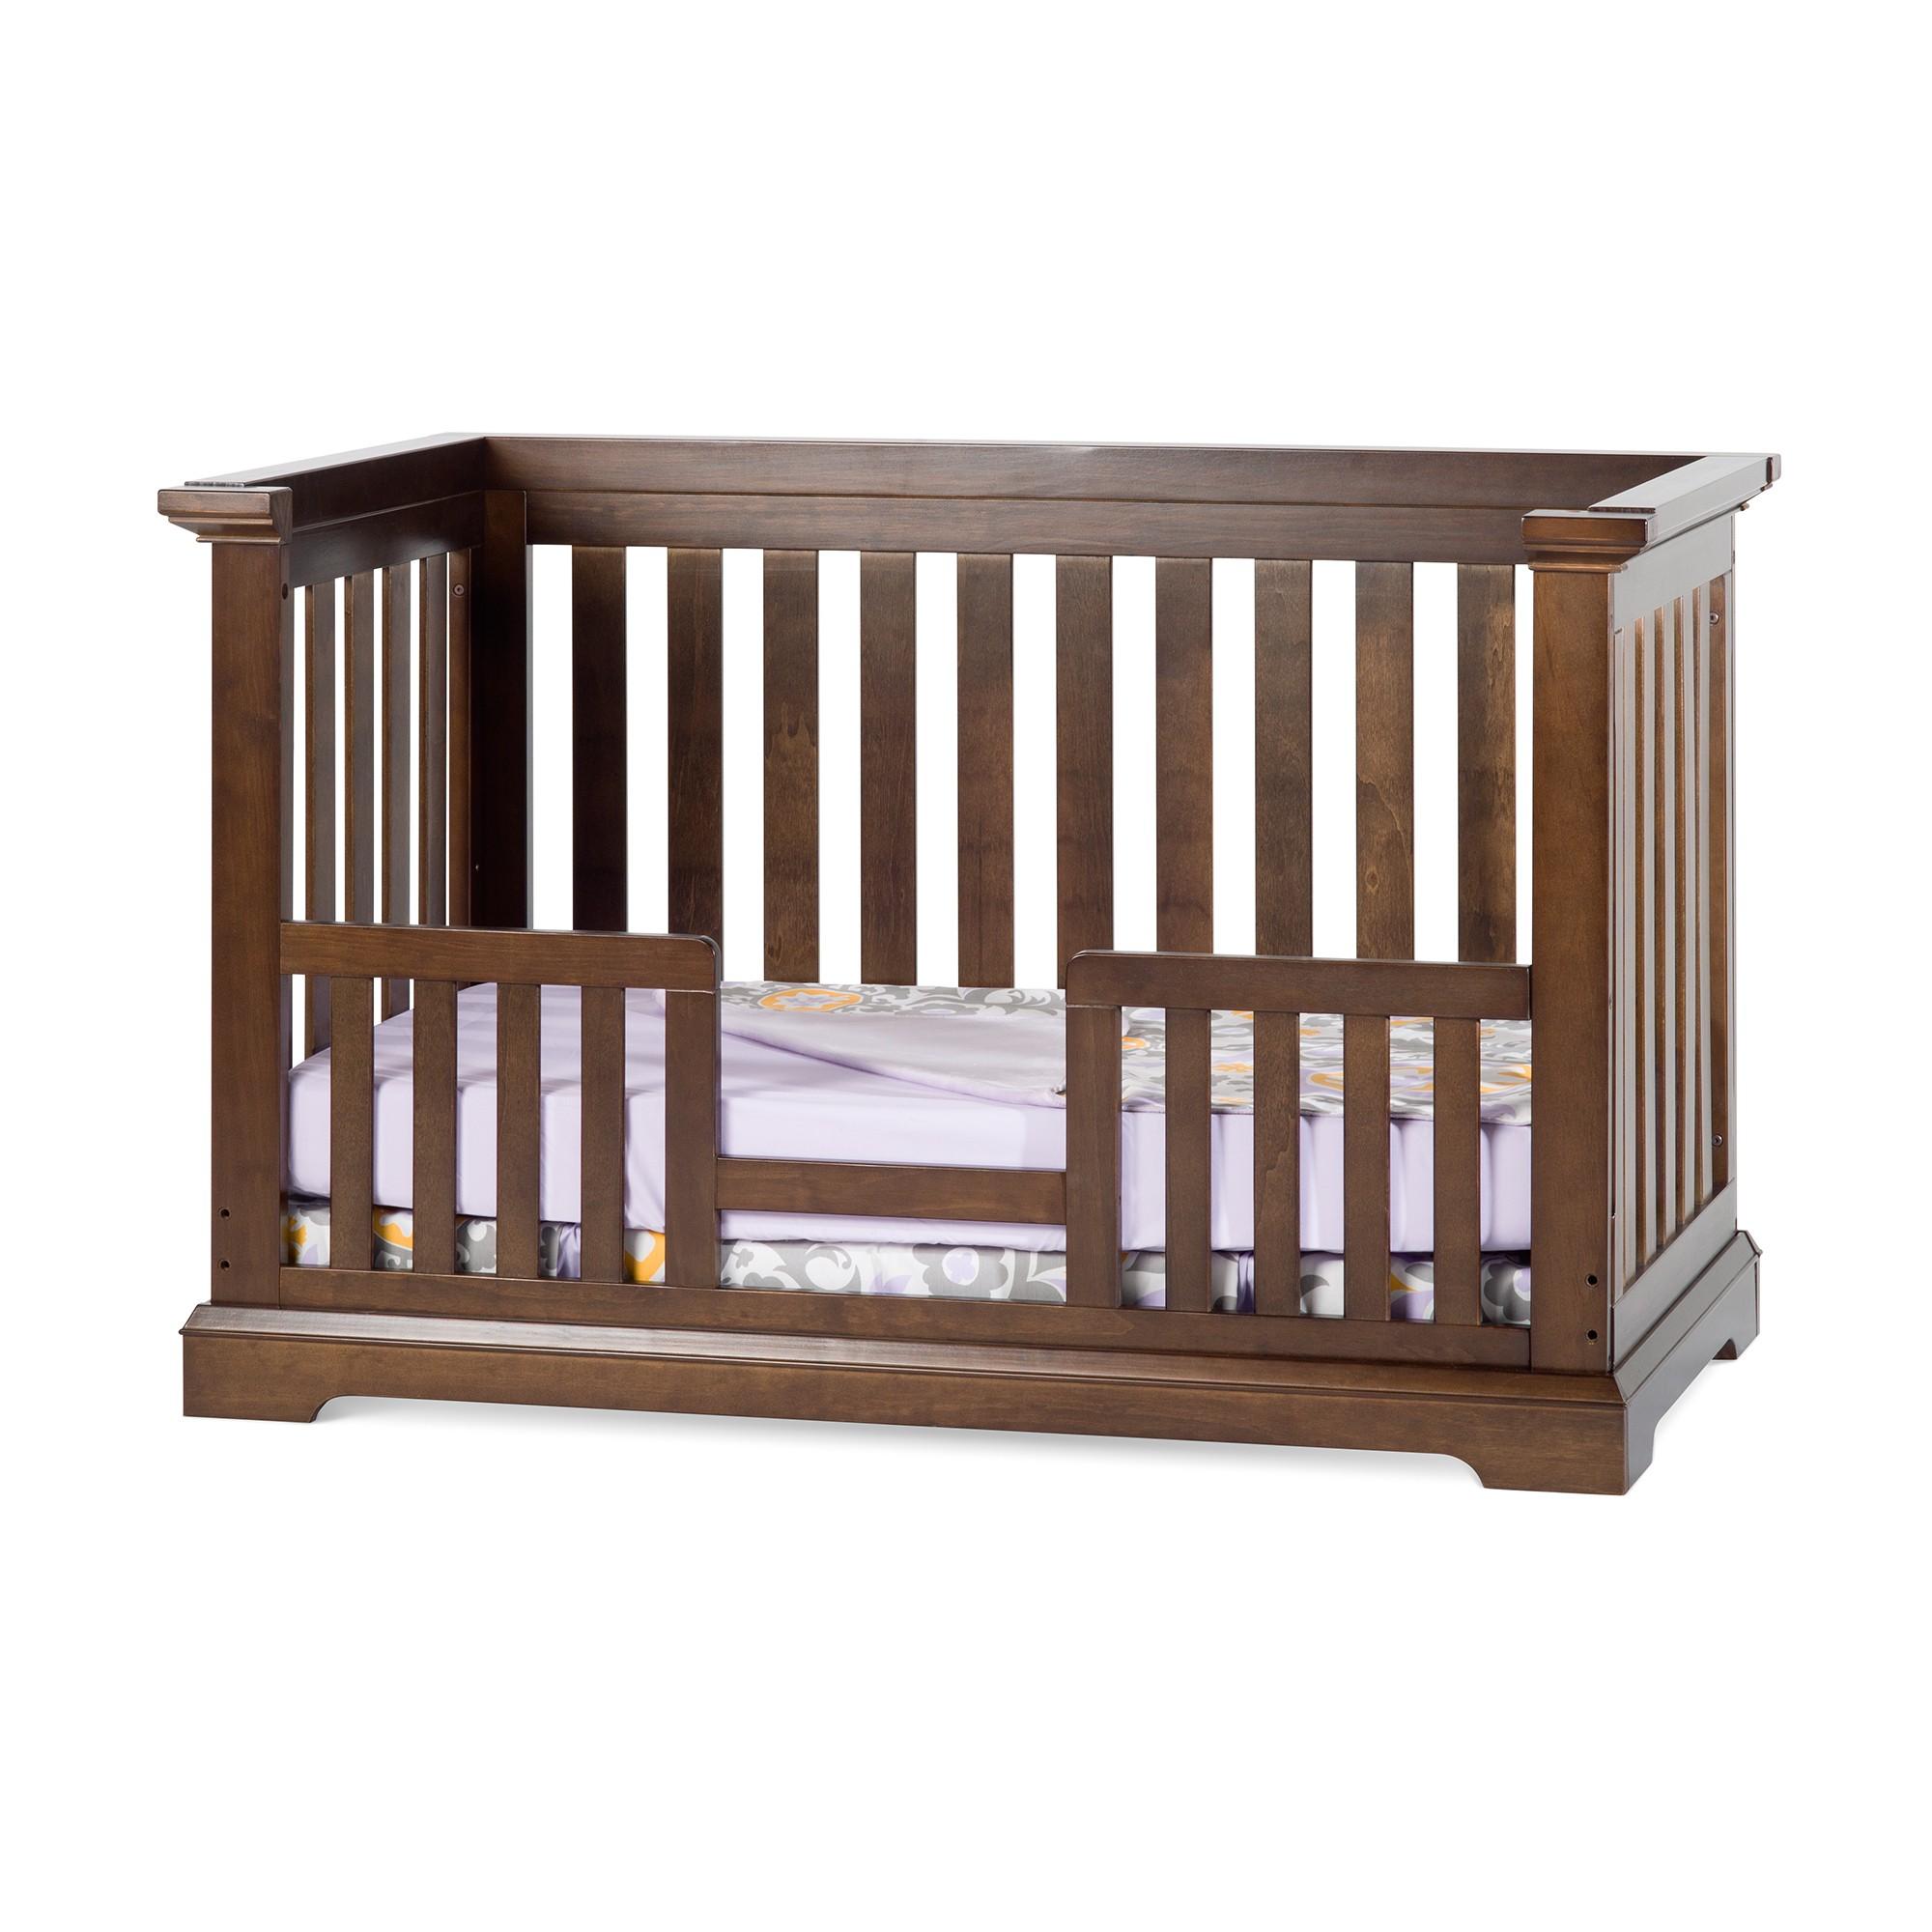 kayden 4 in 1 convertible crib child craft. Black Bedroom Furniture Sets. Home Design Ideas